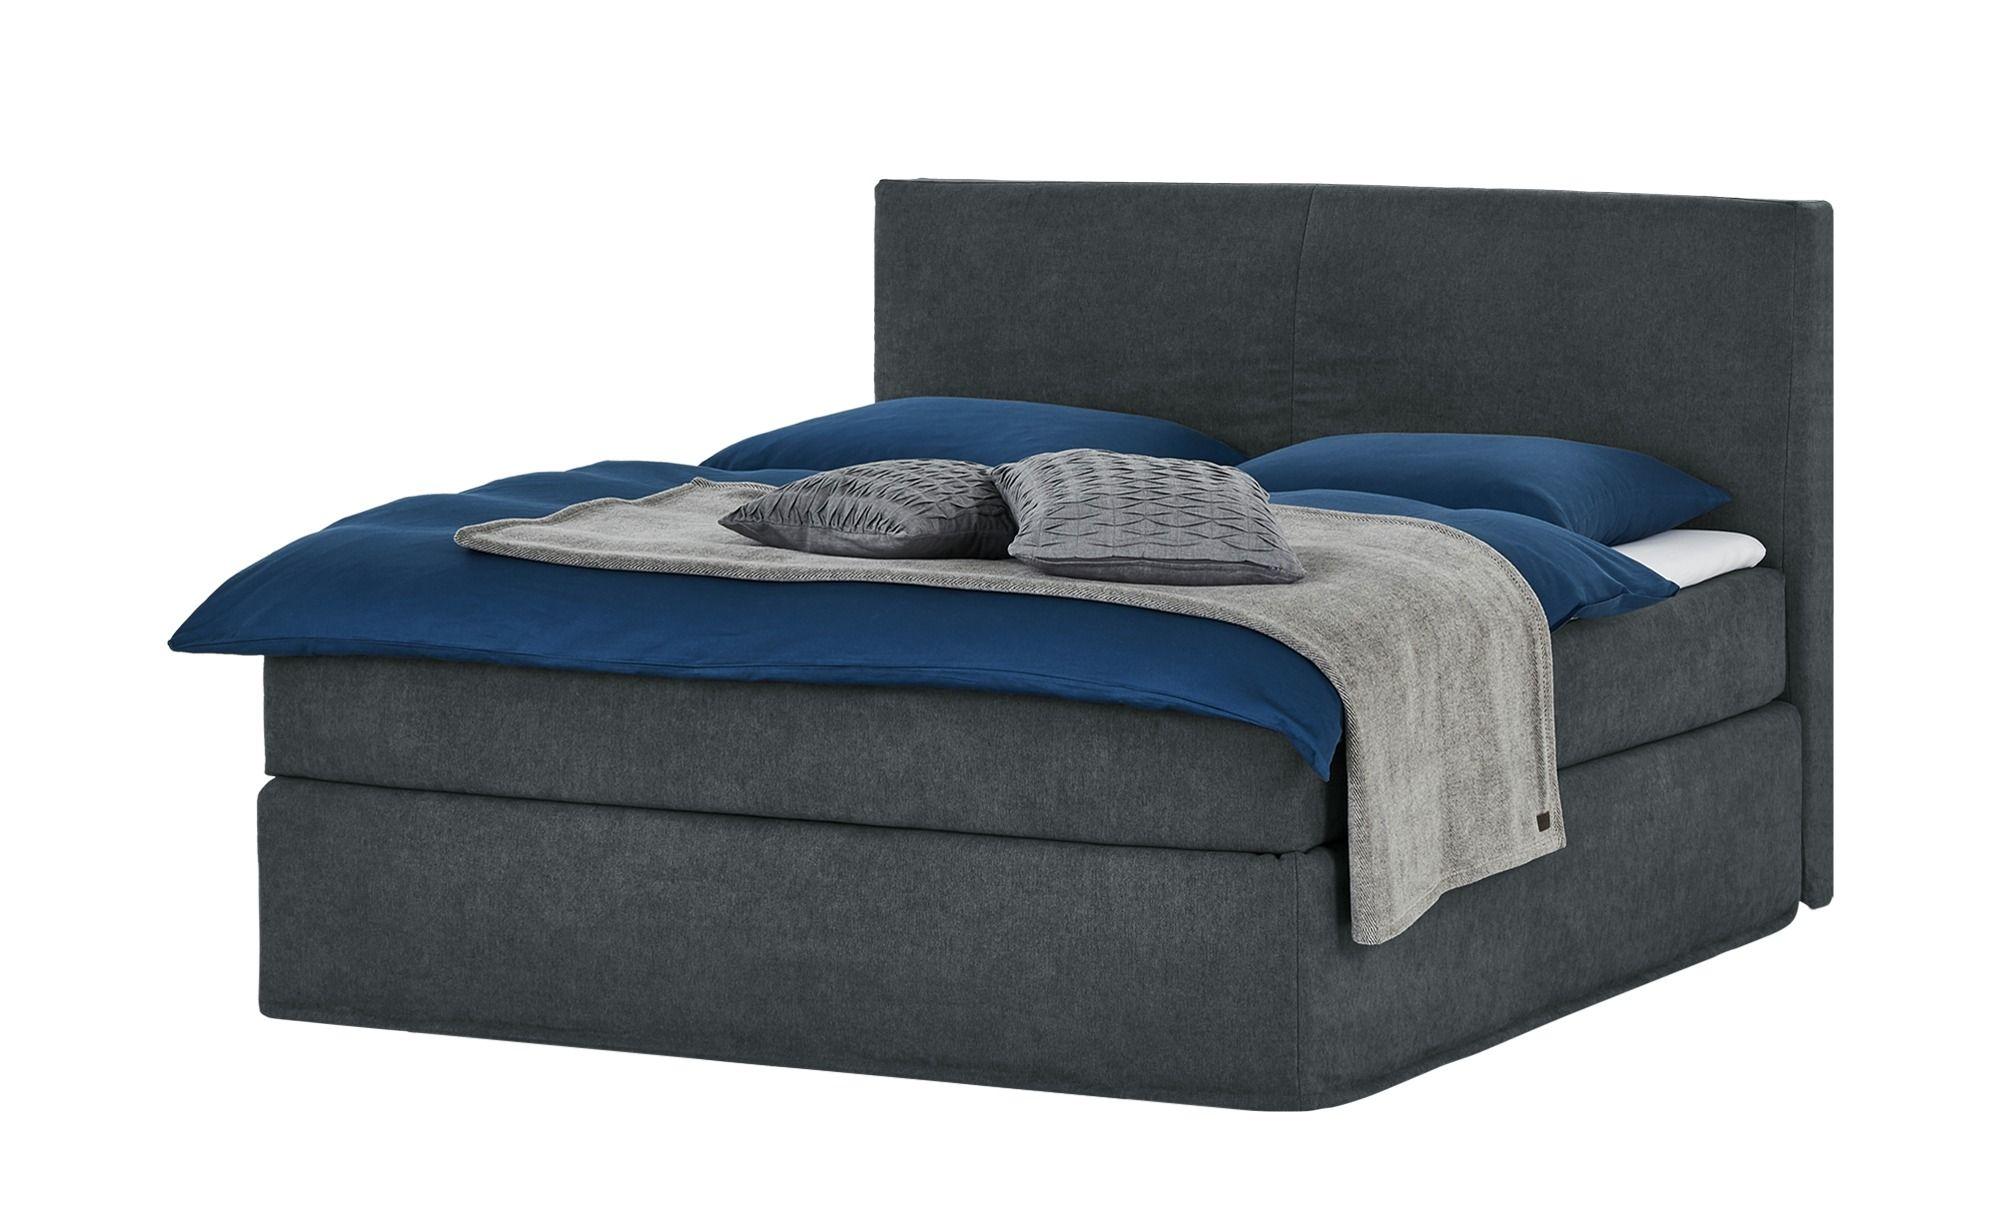 Boxspringbett Boxi Classic Bettfedern Bett Ideen Und Modernes